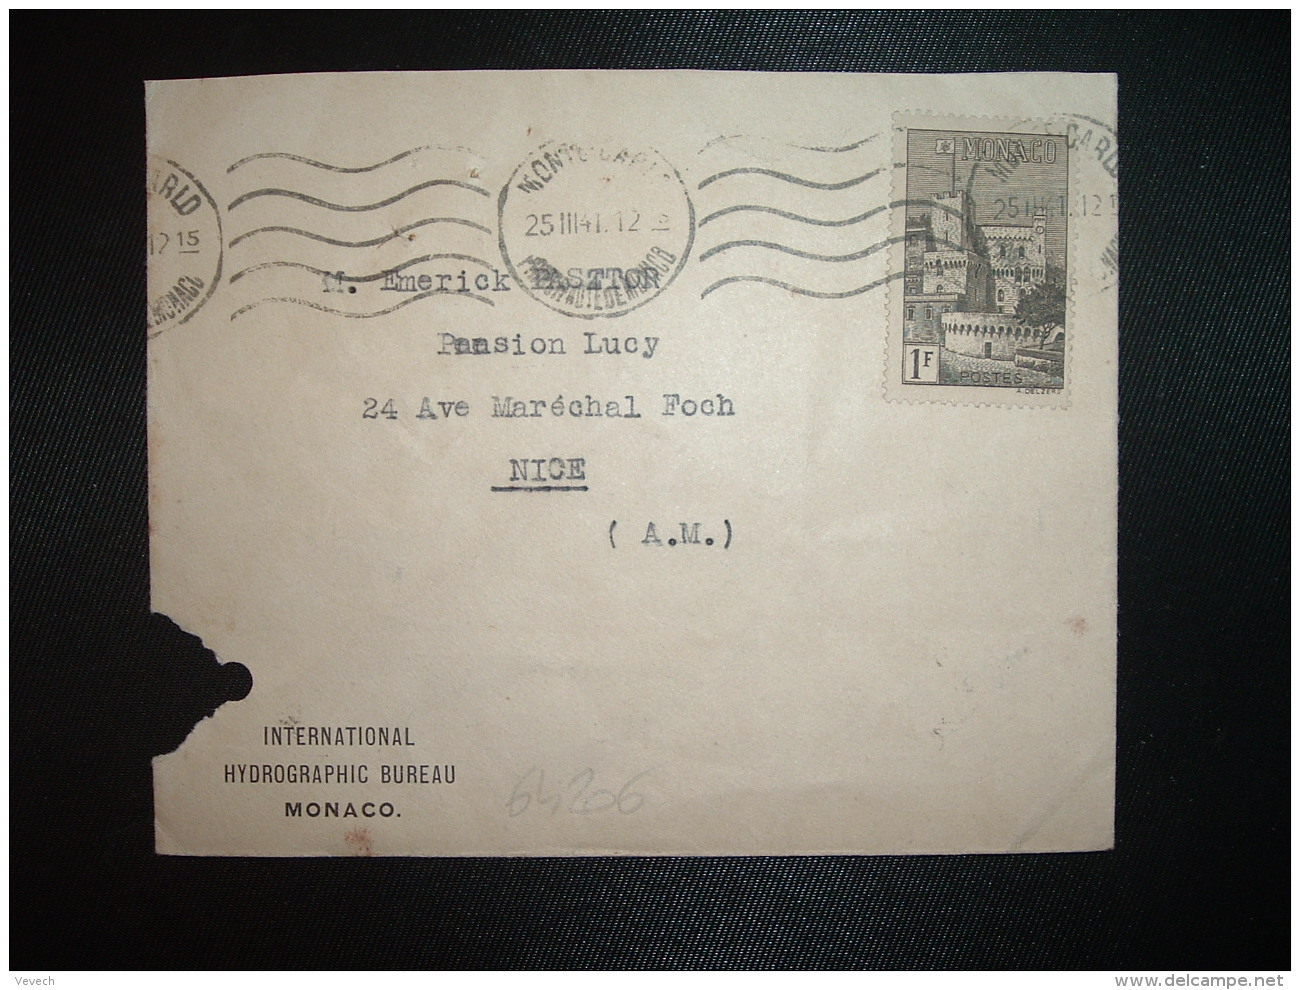 LETTRE TP 1F OBL.MEC.25 III 41 MONTE-CARLO PRINCIPAUTE DE MONACO + INTERNATIONAL HYDROGRAPHIC BUREAU - Covers & Documents